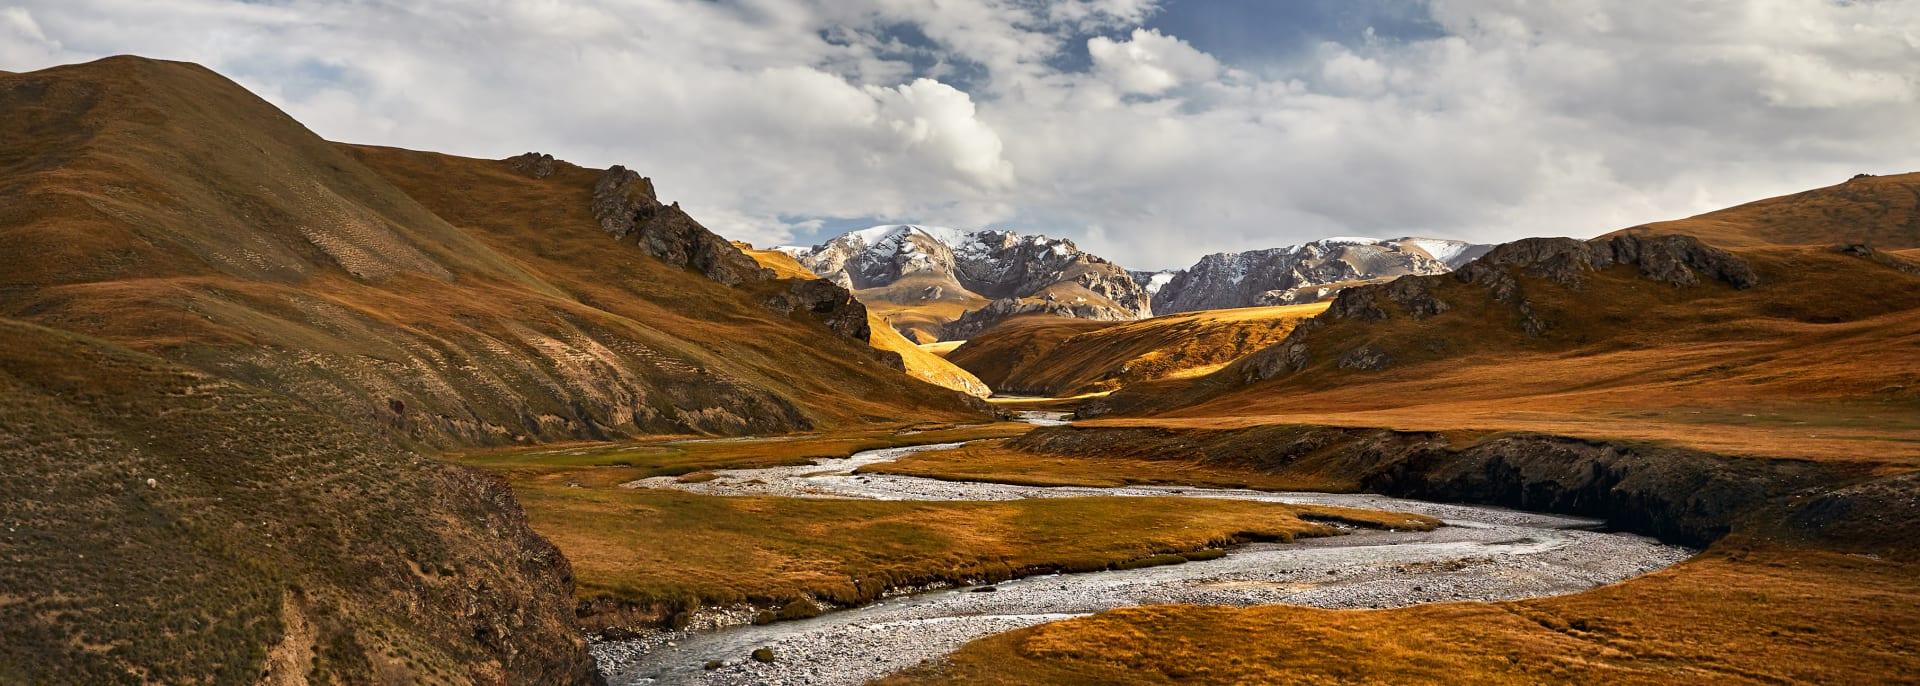 Kel Suu See, Naryn, Kirgistan